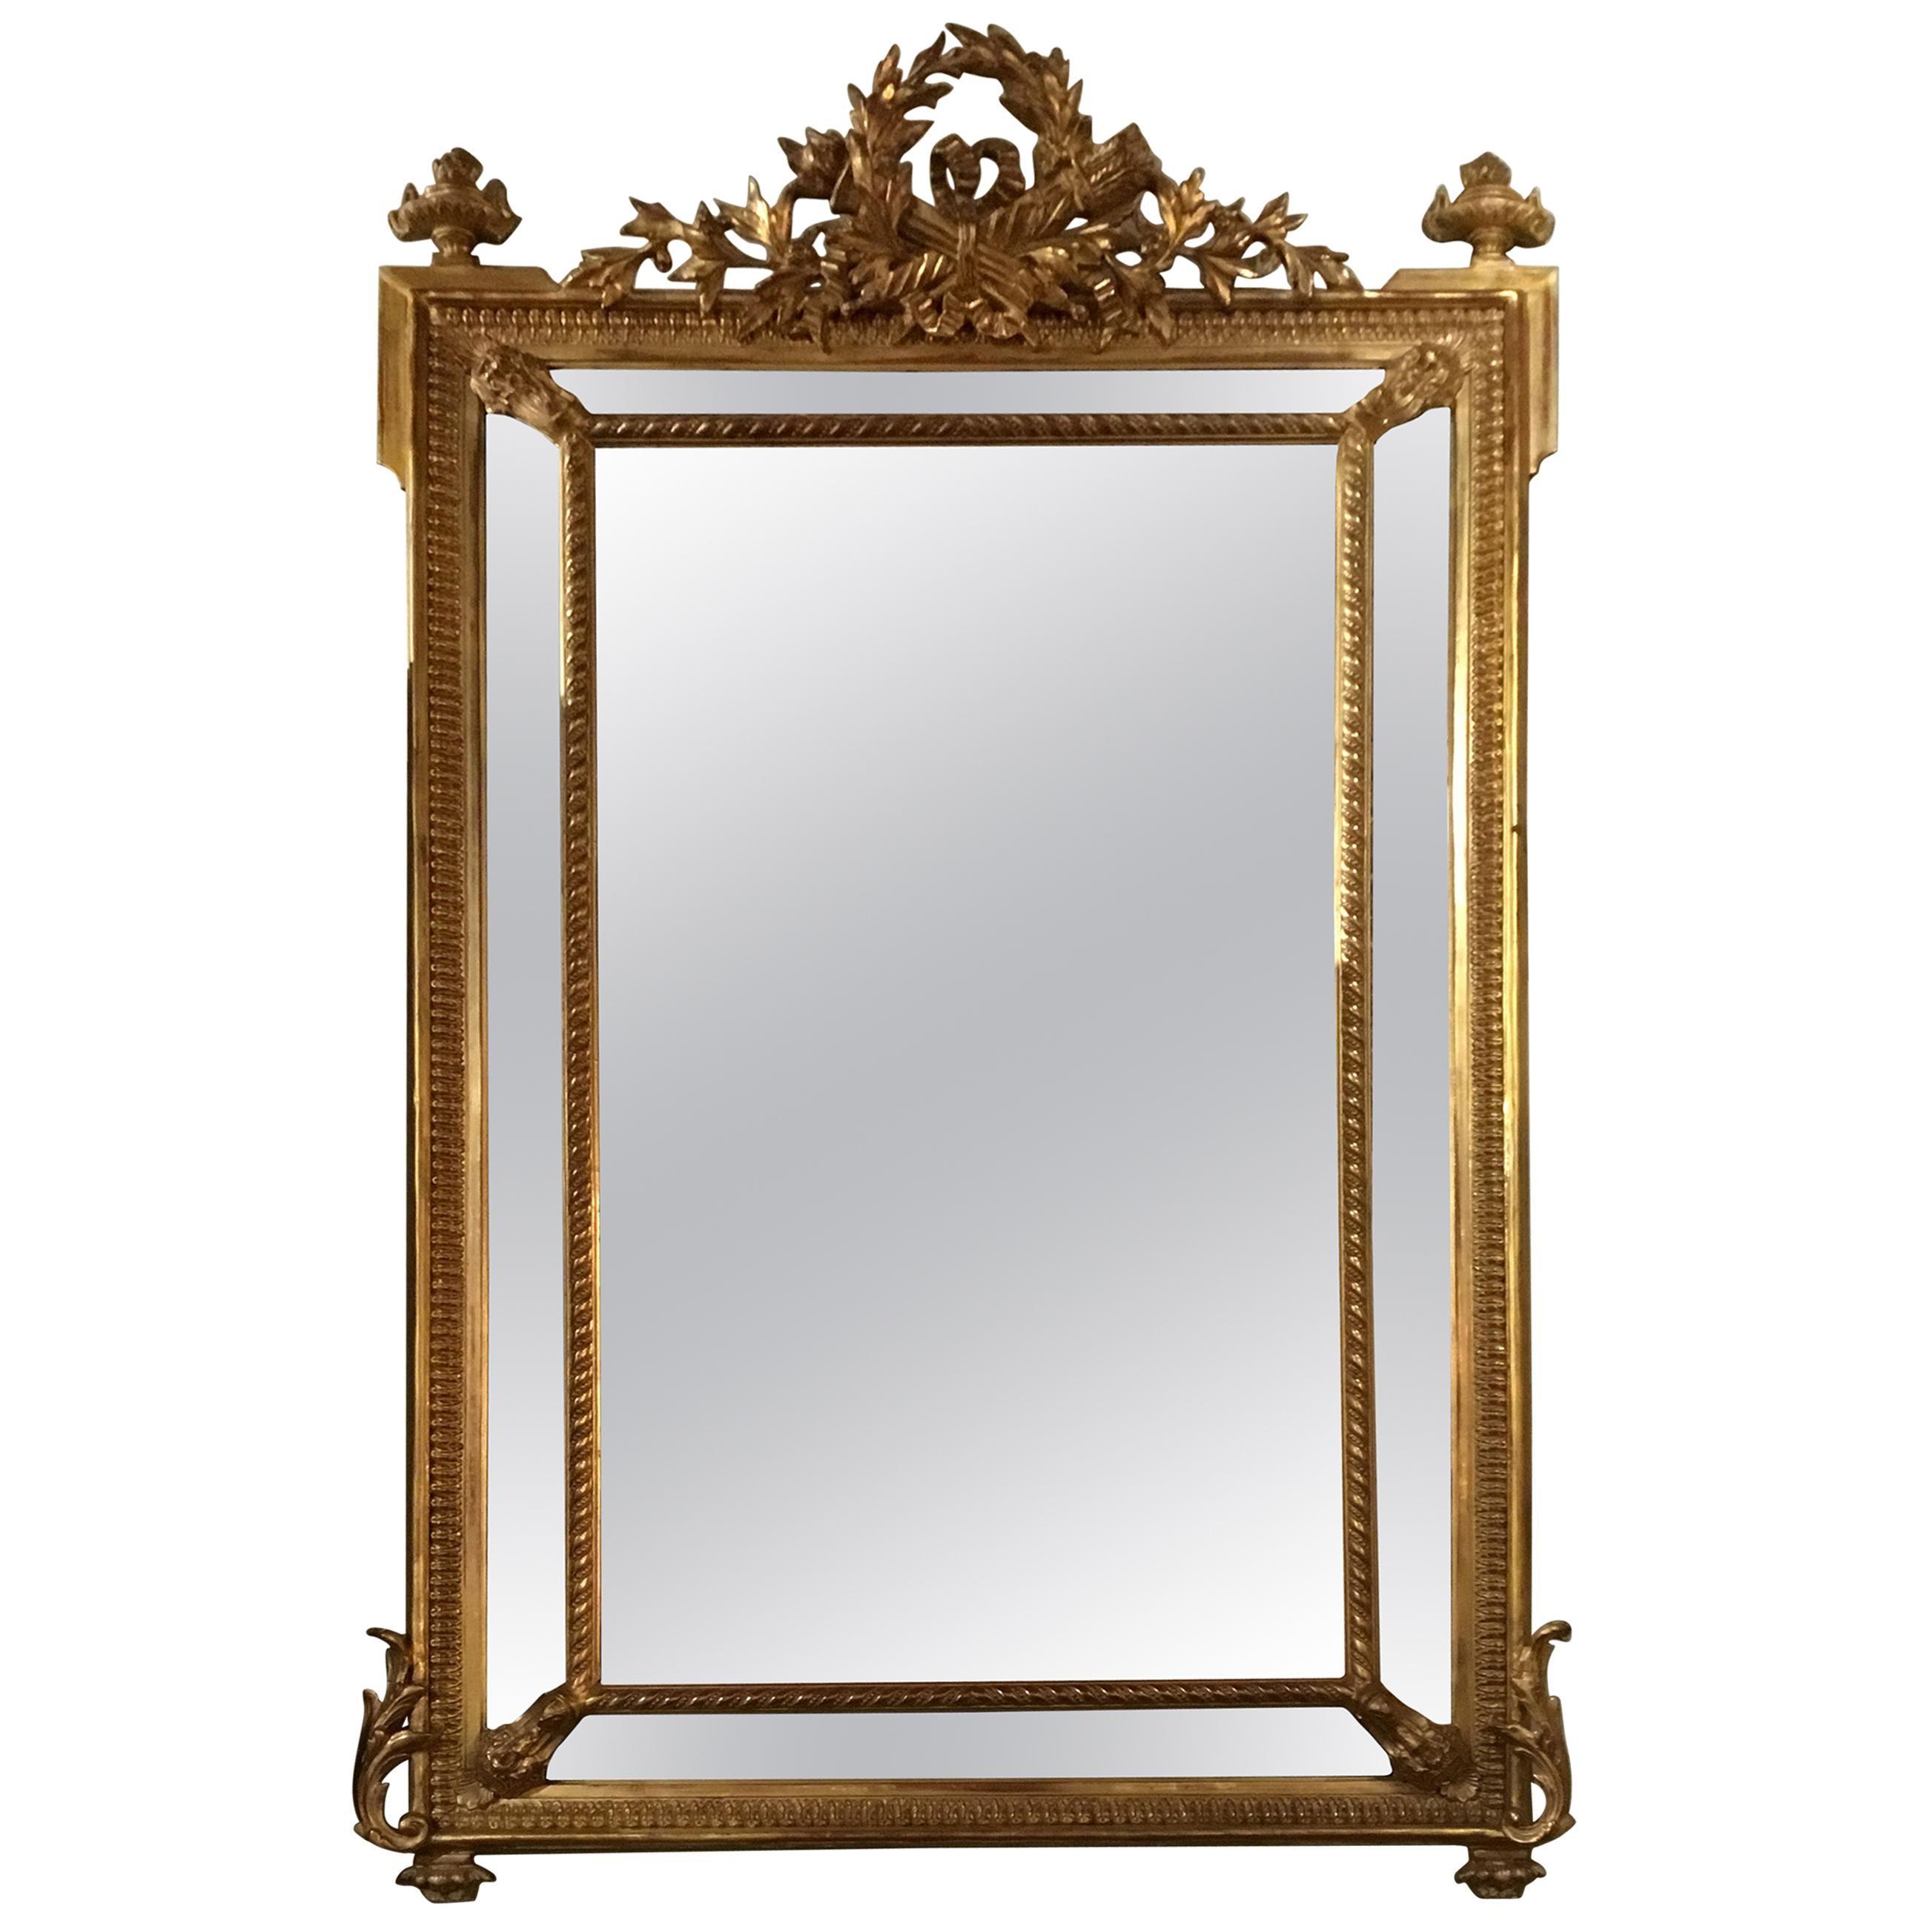 Louis XVI-Style Giltwood Cushion Mirror, 19th Century